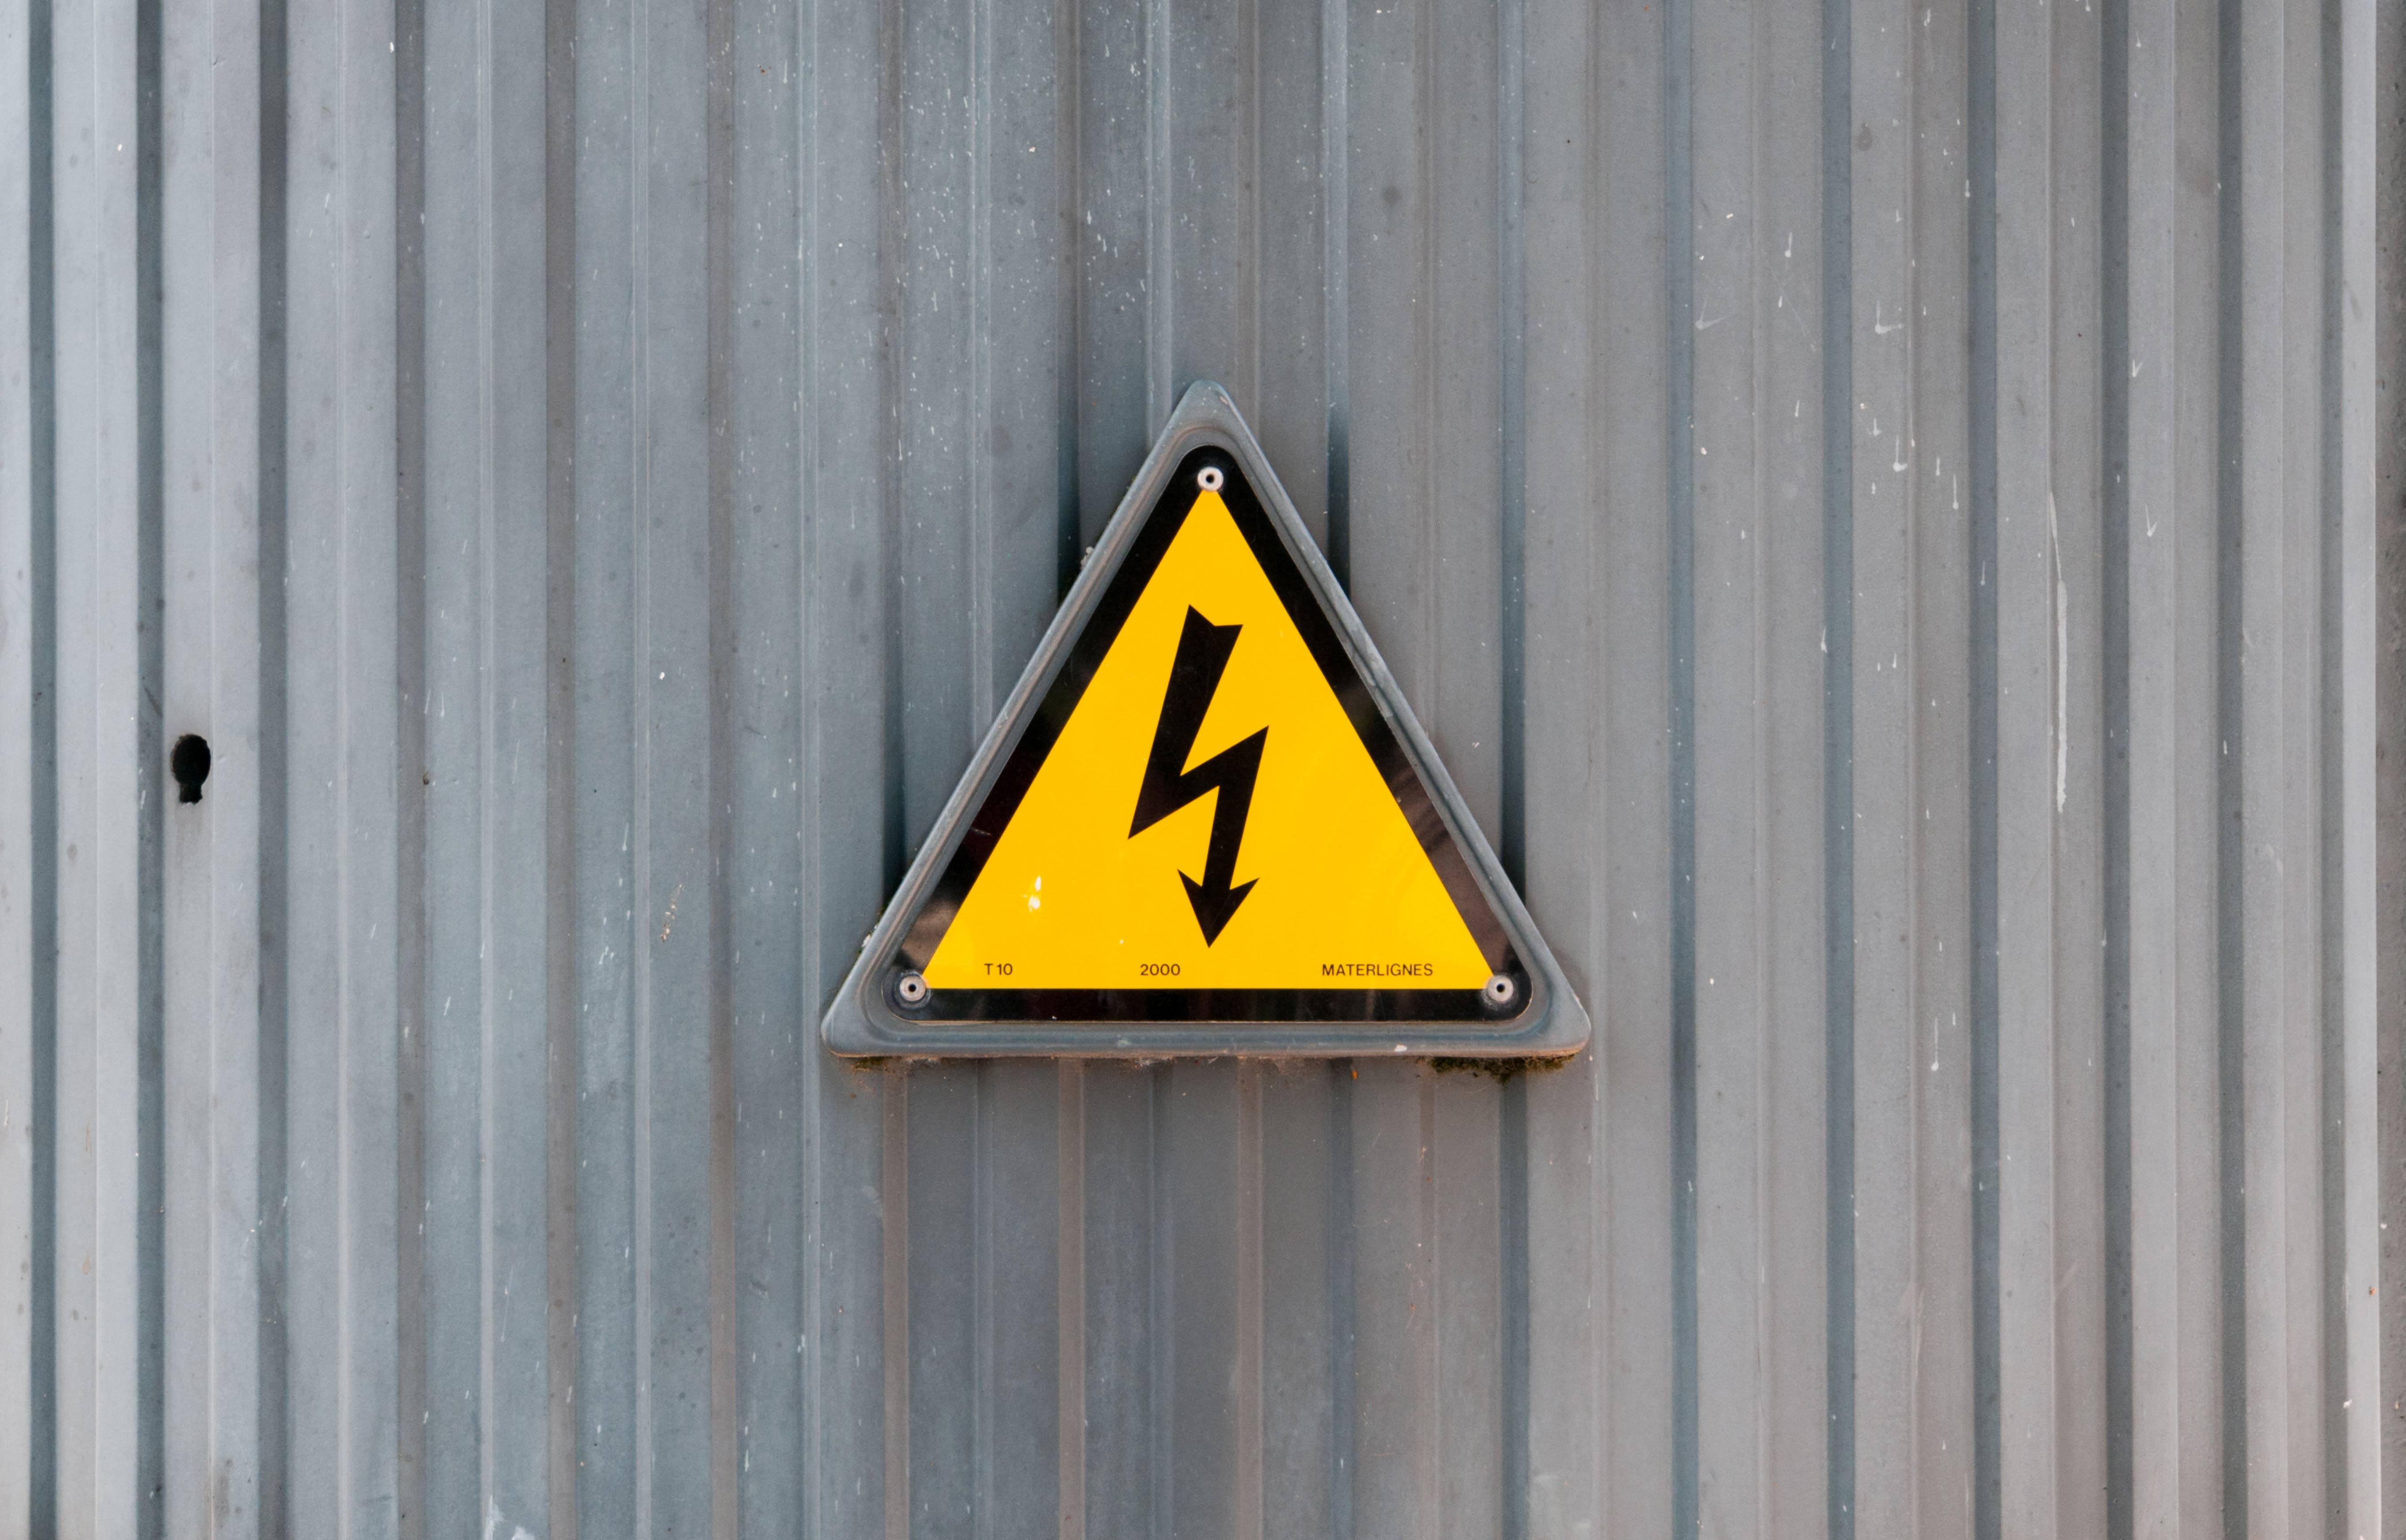 High voltage symbol on metal